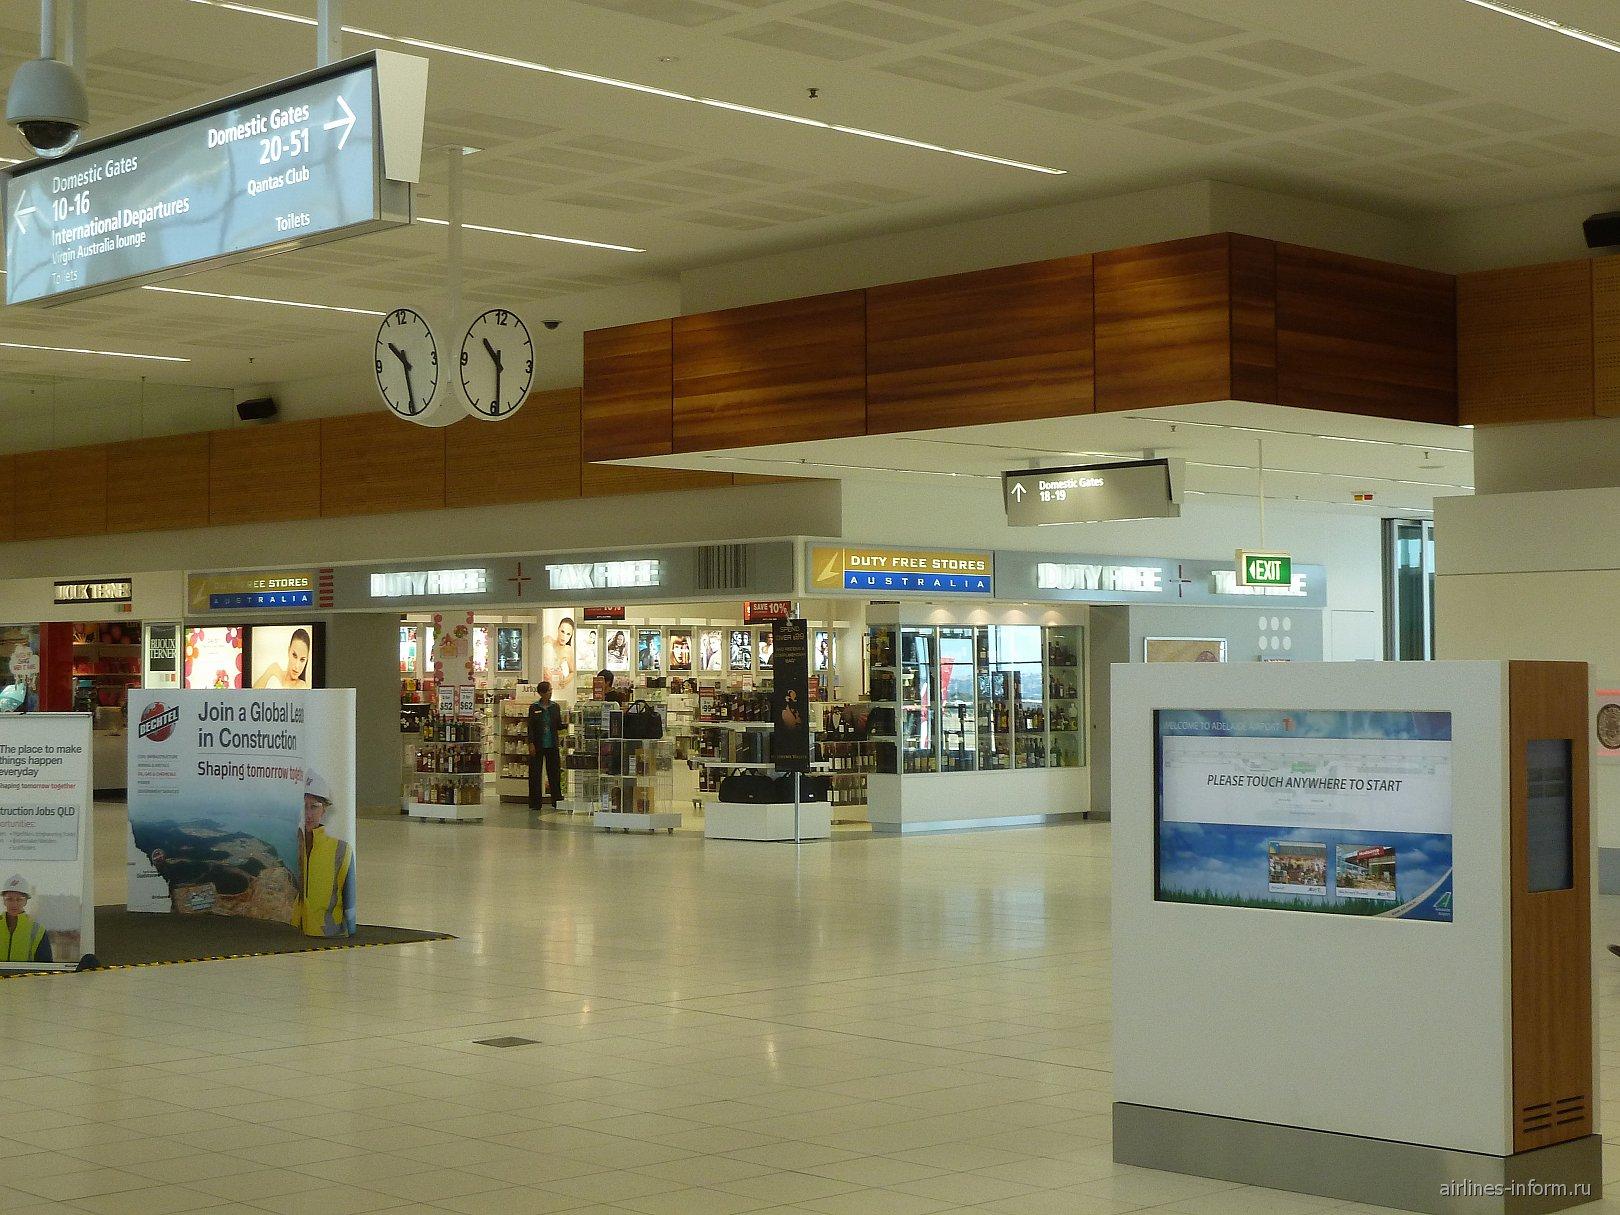 Магазин Duty-free в аэропорту Аделаида